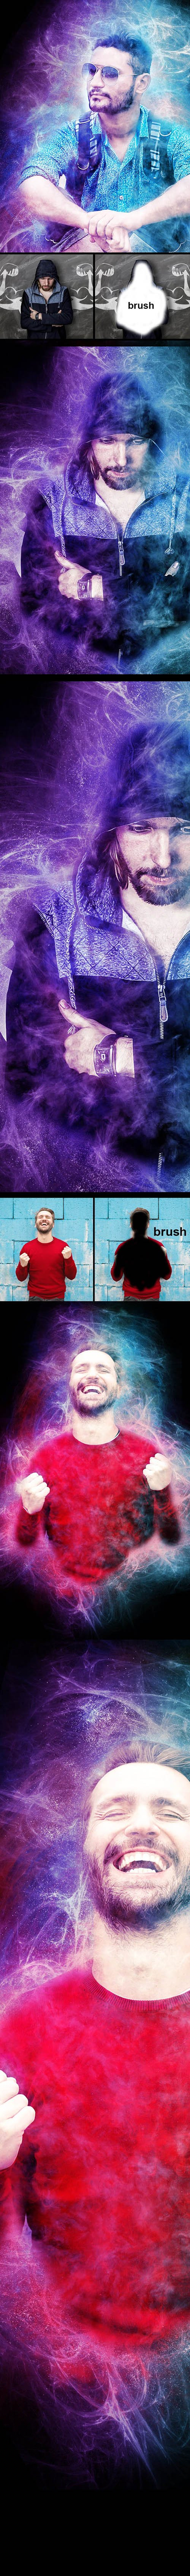 GraphicRiver - Amazing Power Photoshop Action 23444666